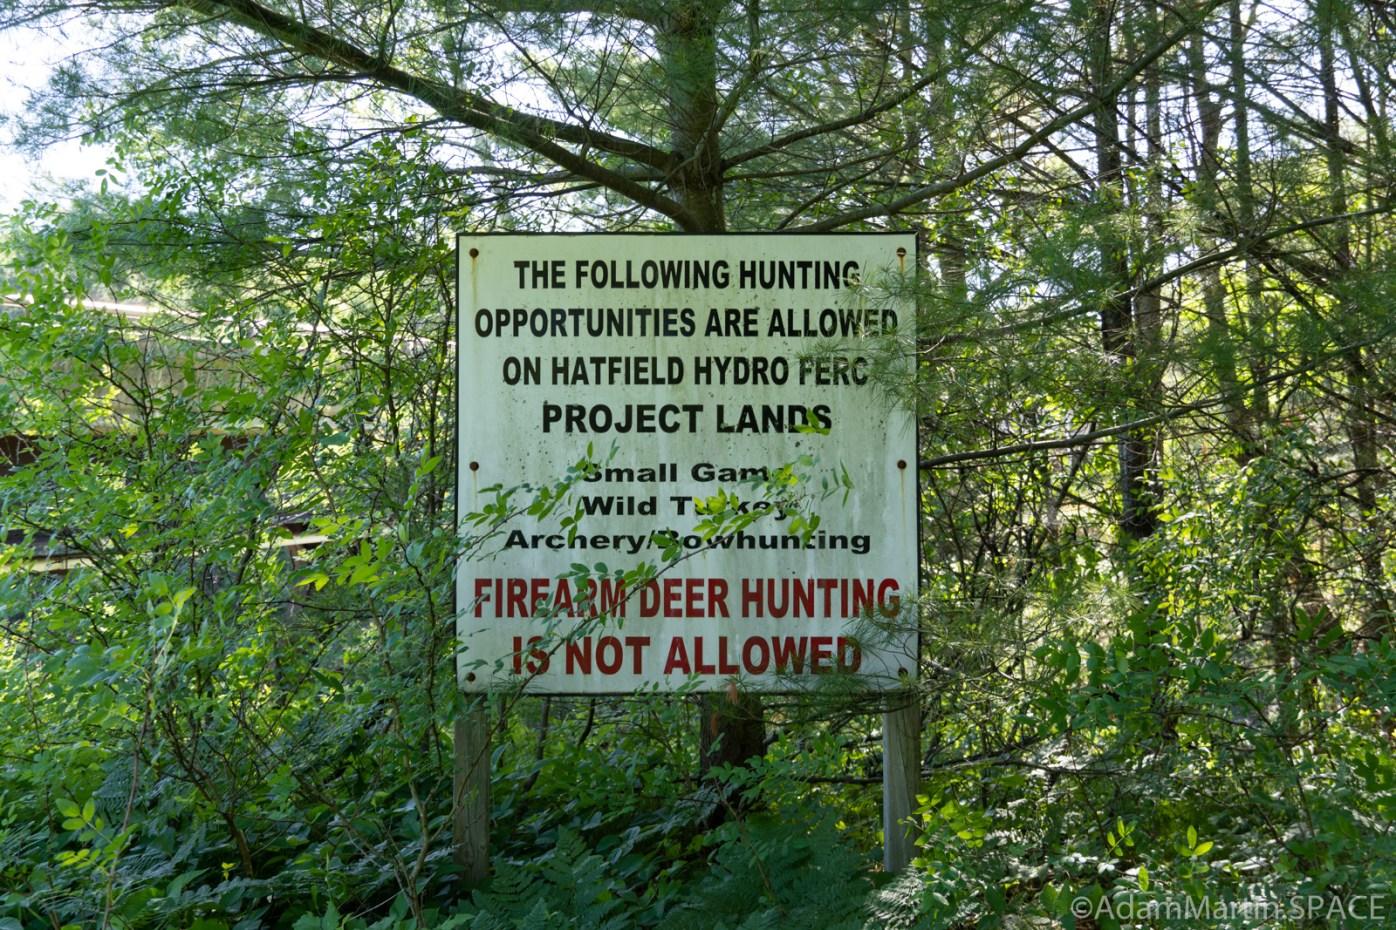 Black River Falls - Hwy K Rapids - Hatfield Hydro sign re: hunting